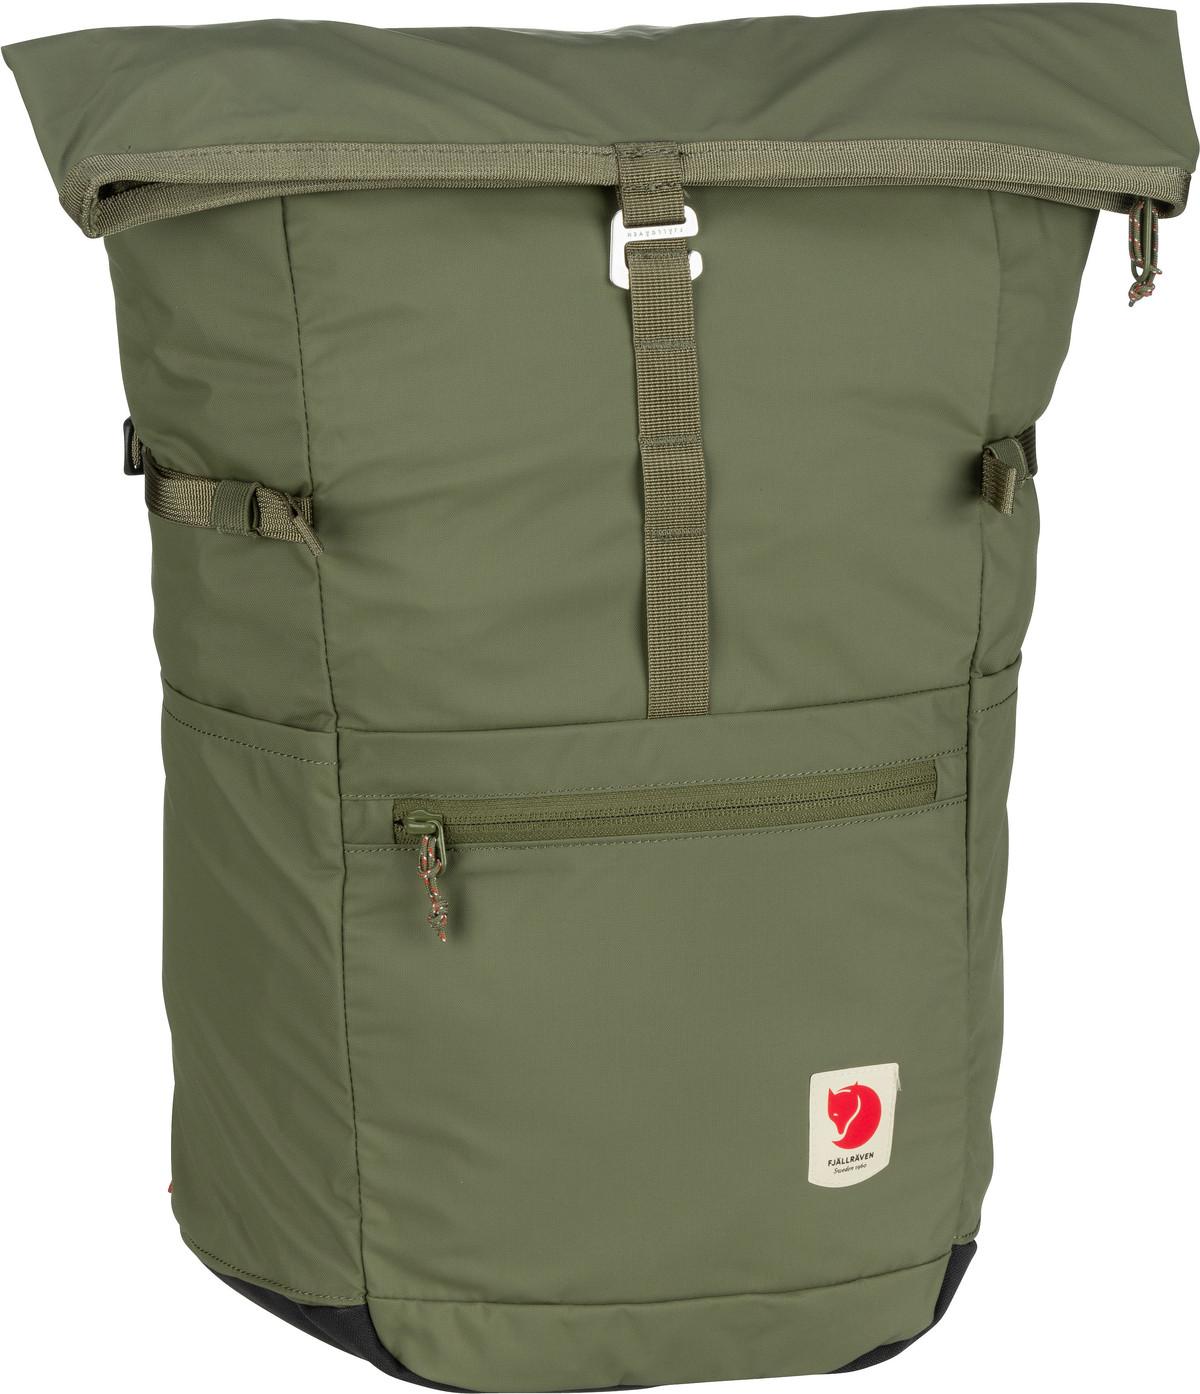 Rucksack / Daypack High Coast Foldsack 24 Green (24 Liter)